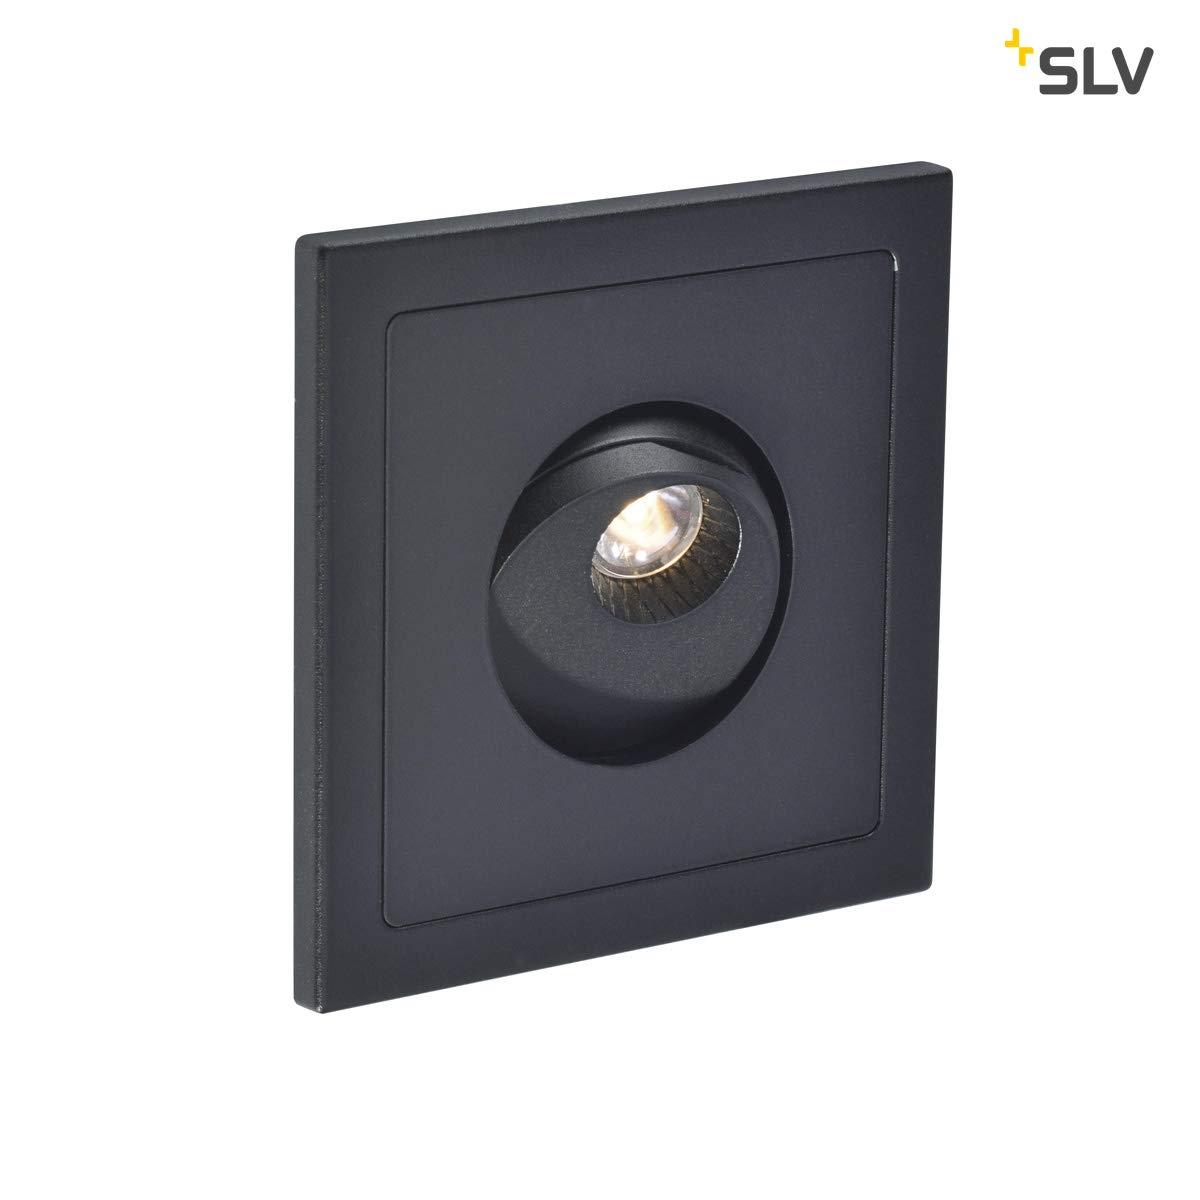 SLV PHO PHO PHO Leuchte Indoor-Lampe Aluminium Schwarz Lampe innen, Innen-Lampe f5ca91